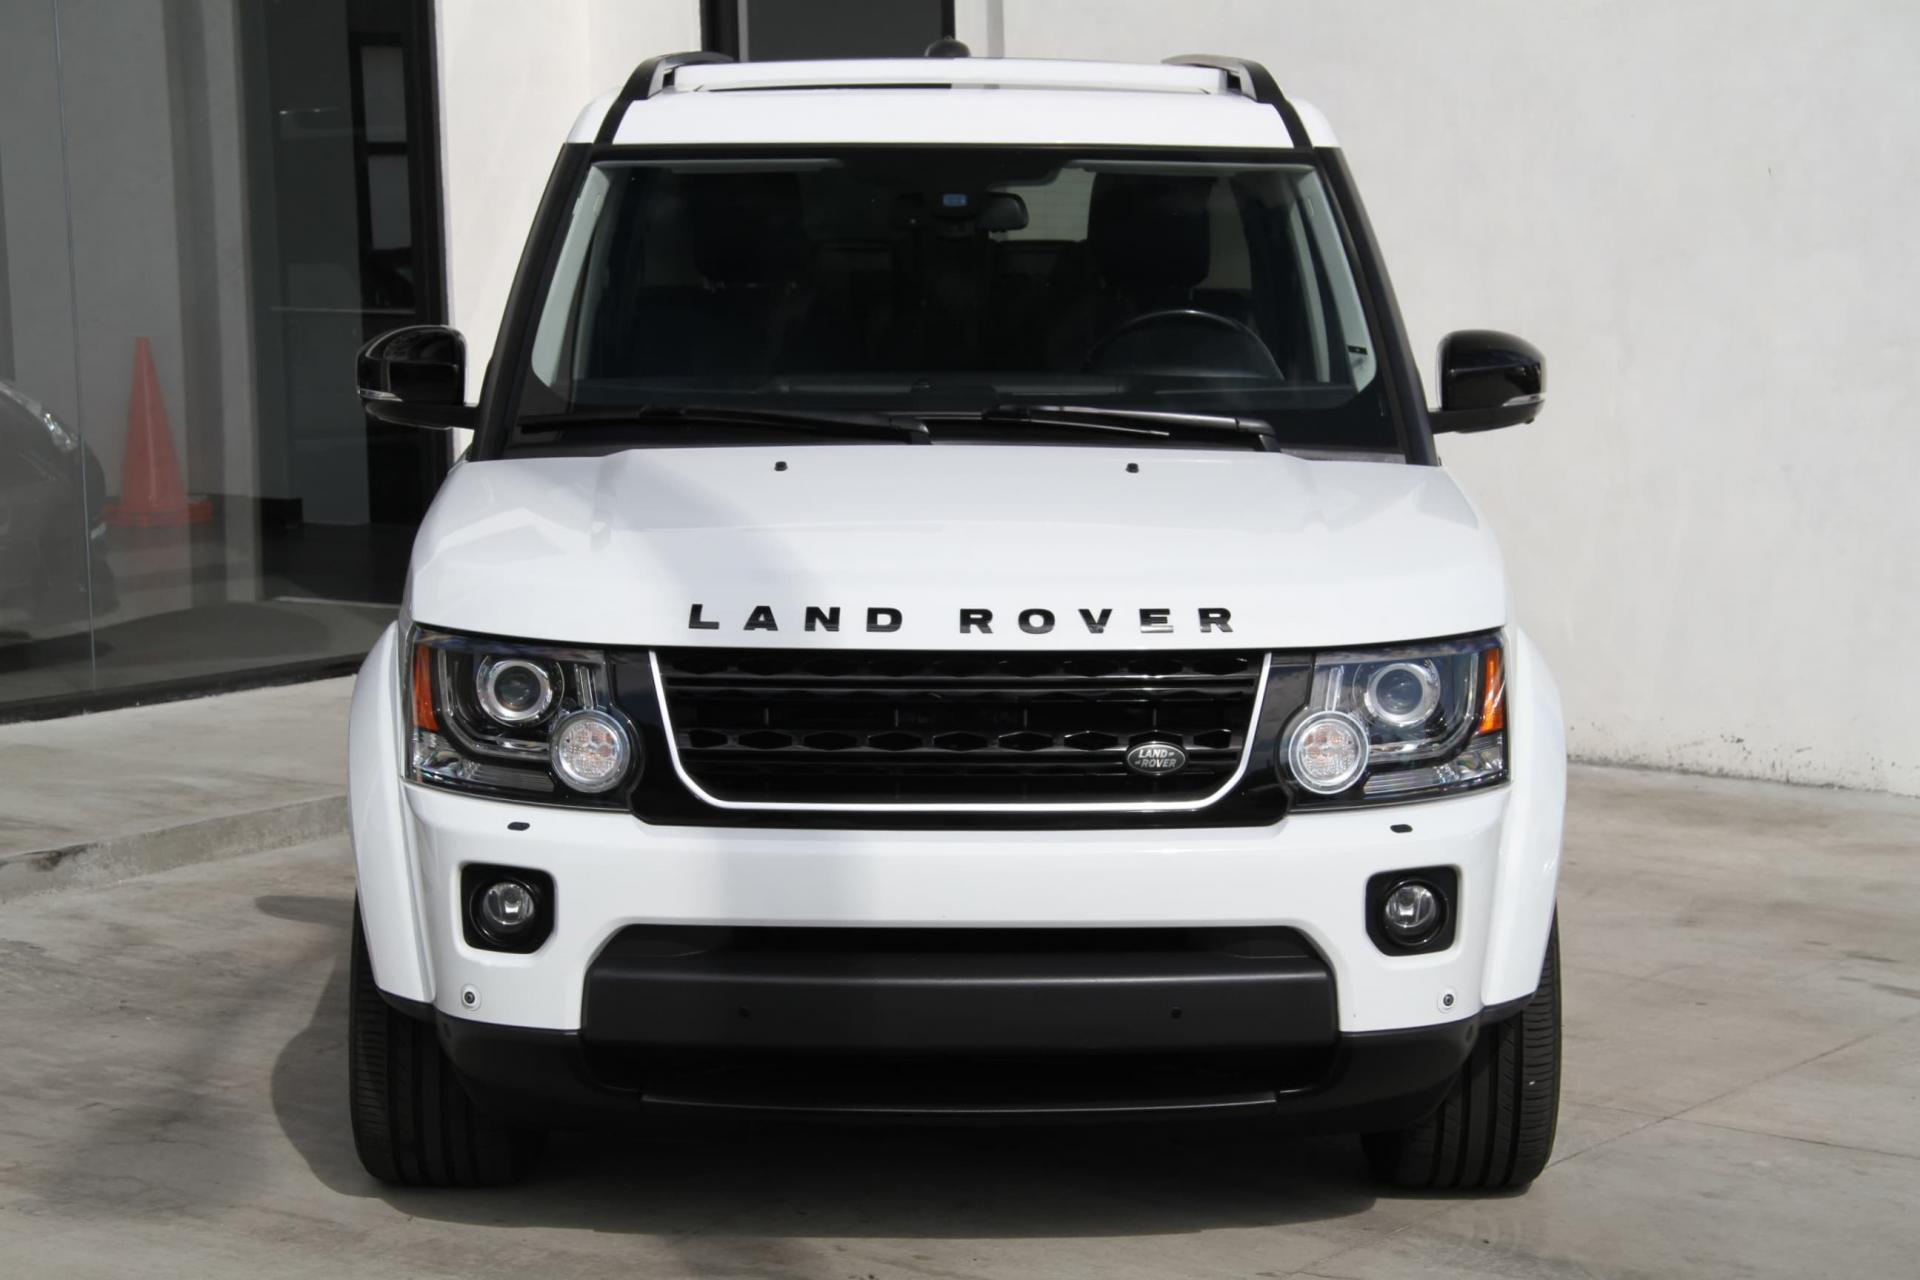 2014 land rover lr4 hse black design package stock 5988 for sale near redondo beach ca. Black Bedroom Furniture Sets. Home Design Ideas